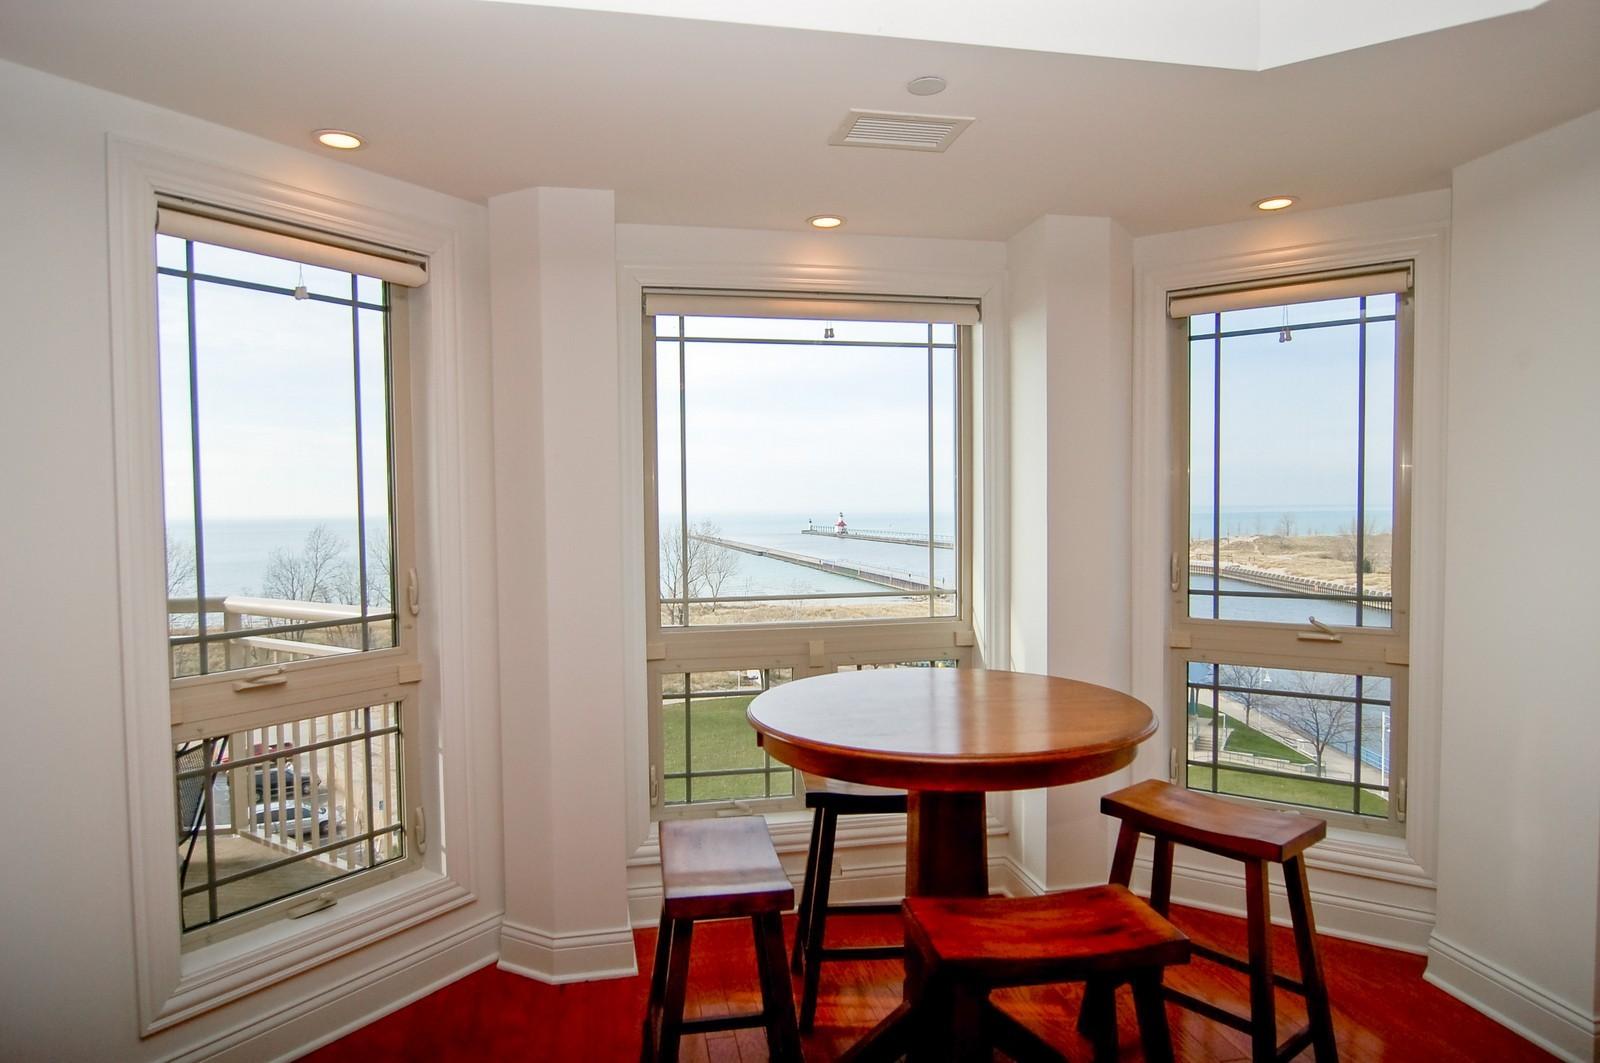 Real Estate Photography - 200- 7B Lake Street, St Joseph, MI, 49085 - View